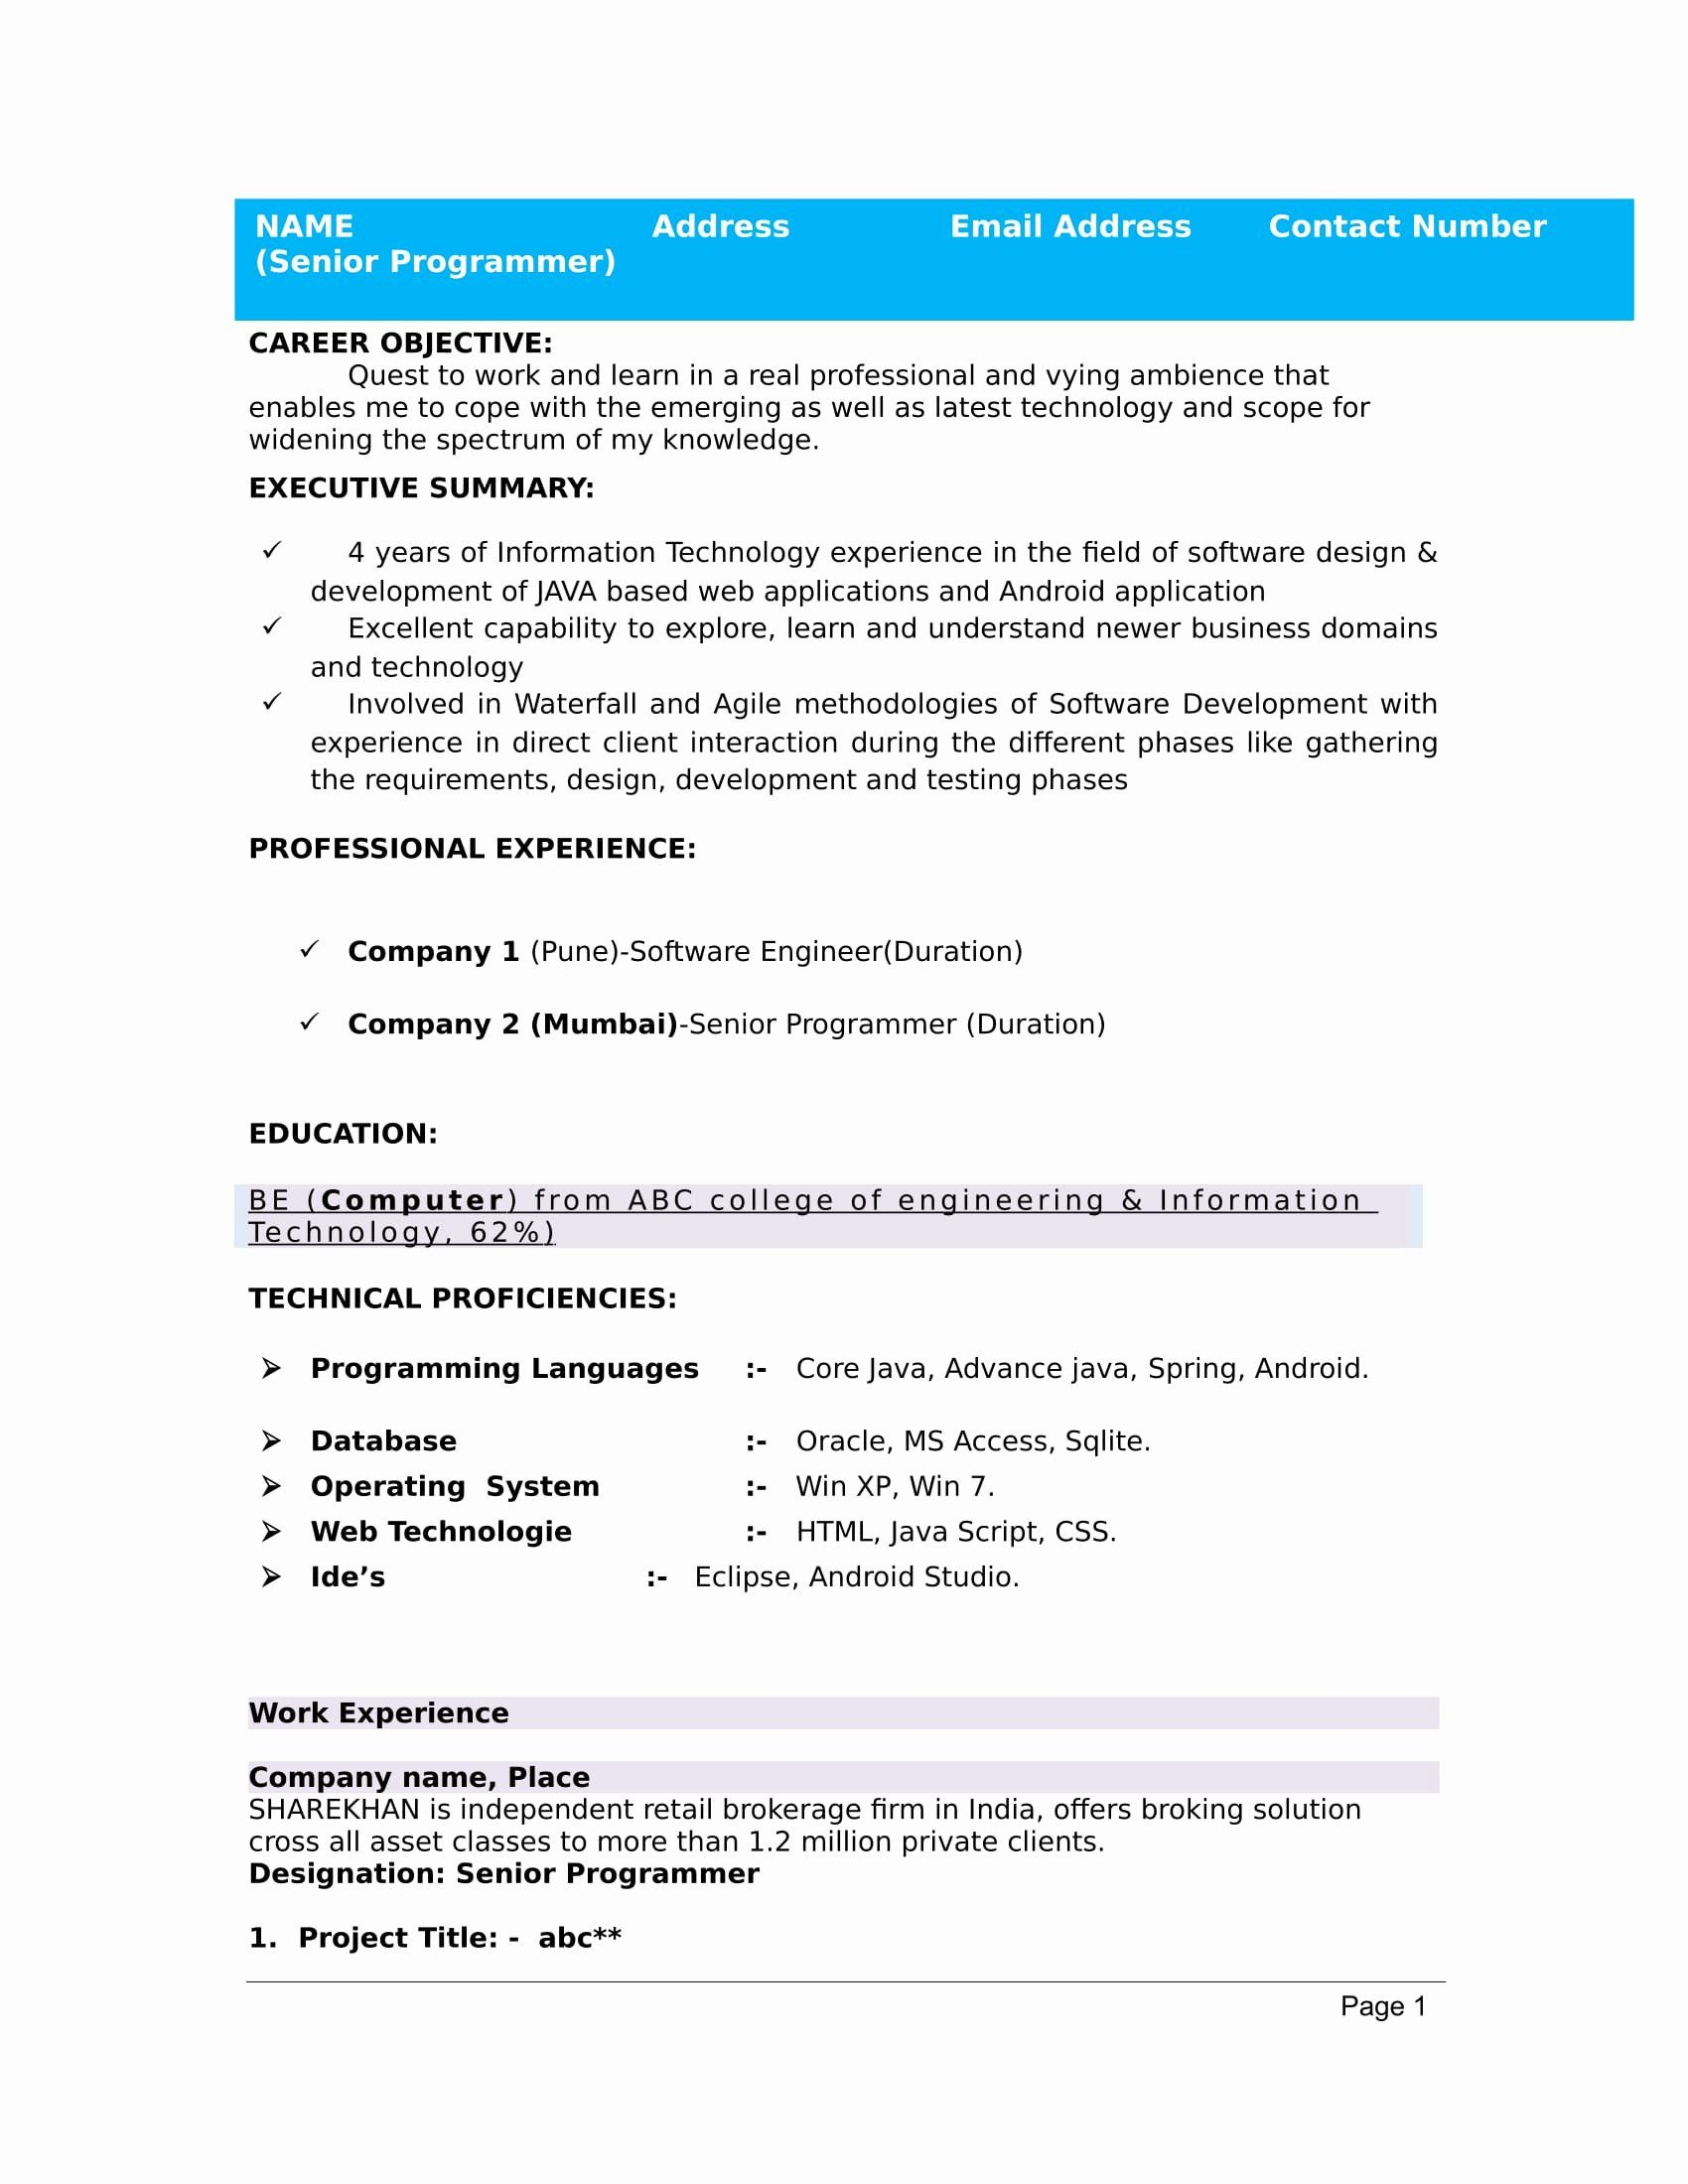 Resume Templates For Freshers Cse